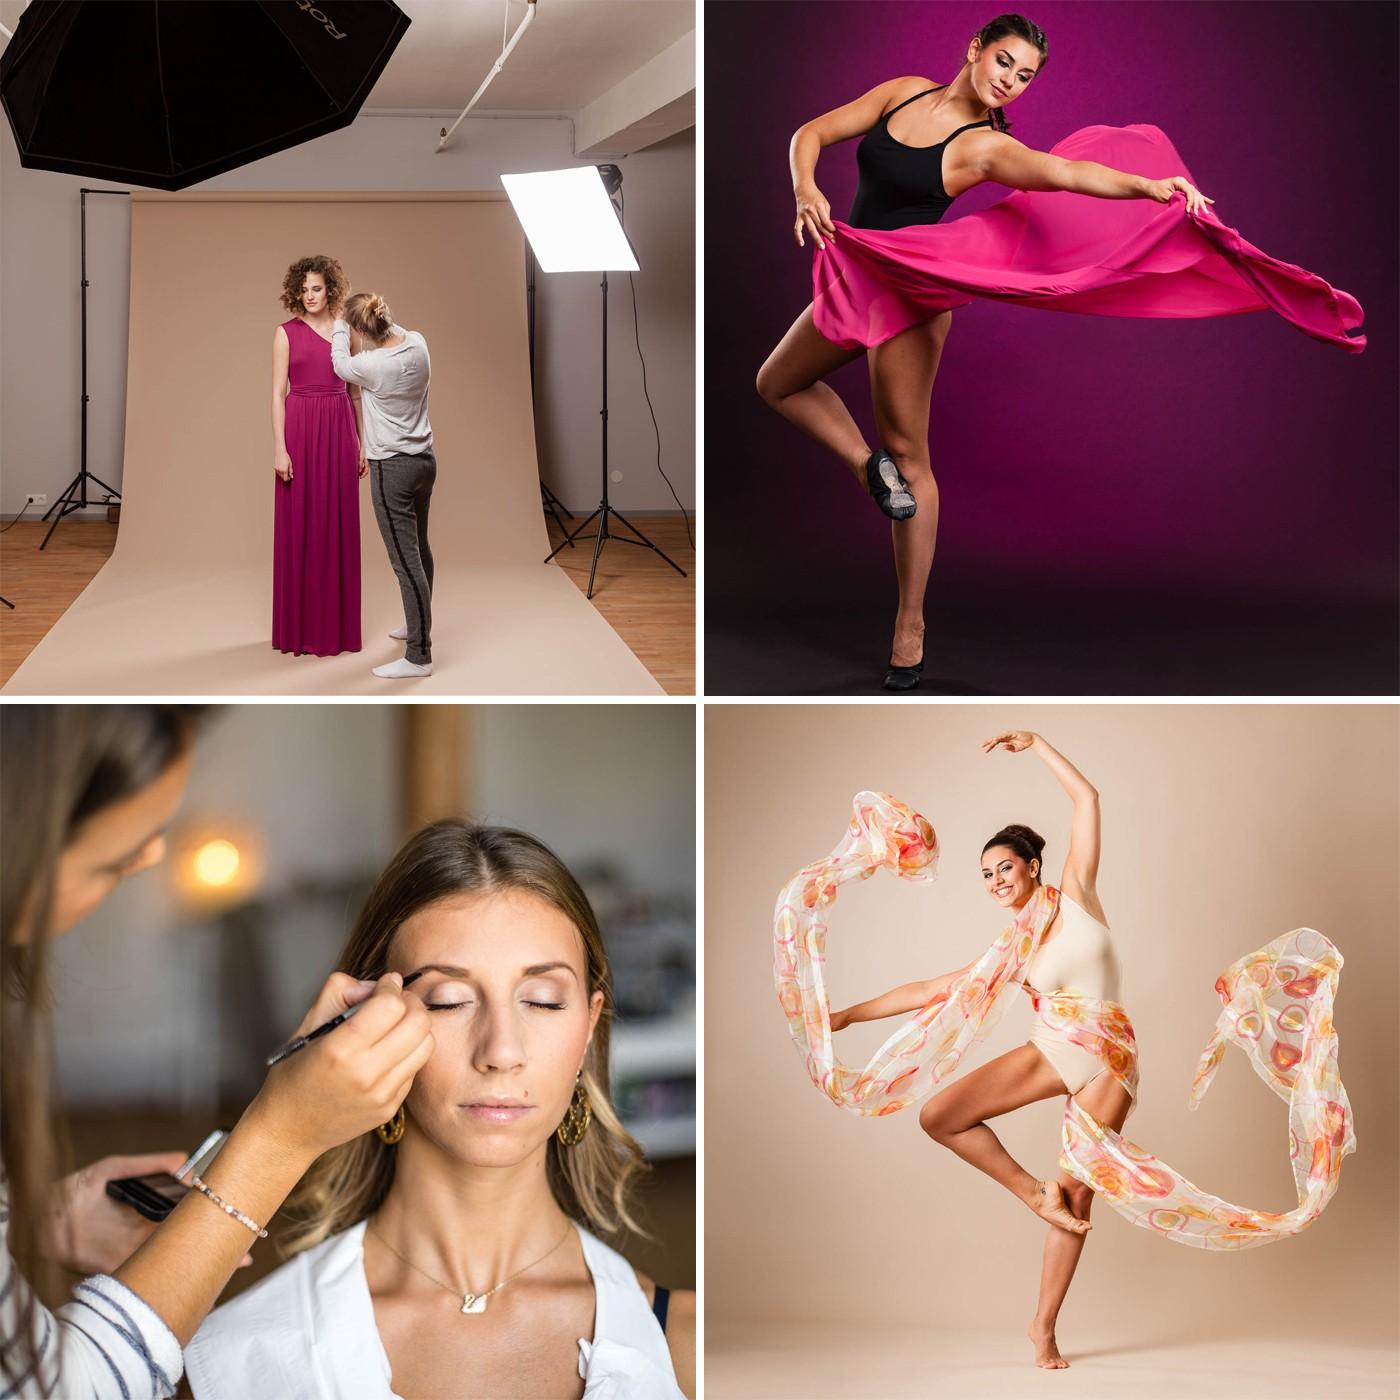 making-of-fotos-fotoshootings-fotostudio-christina-gaio-absam-tirol